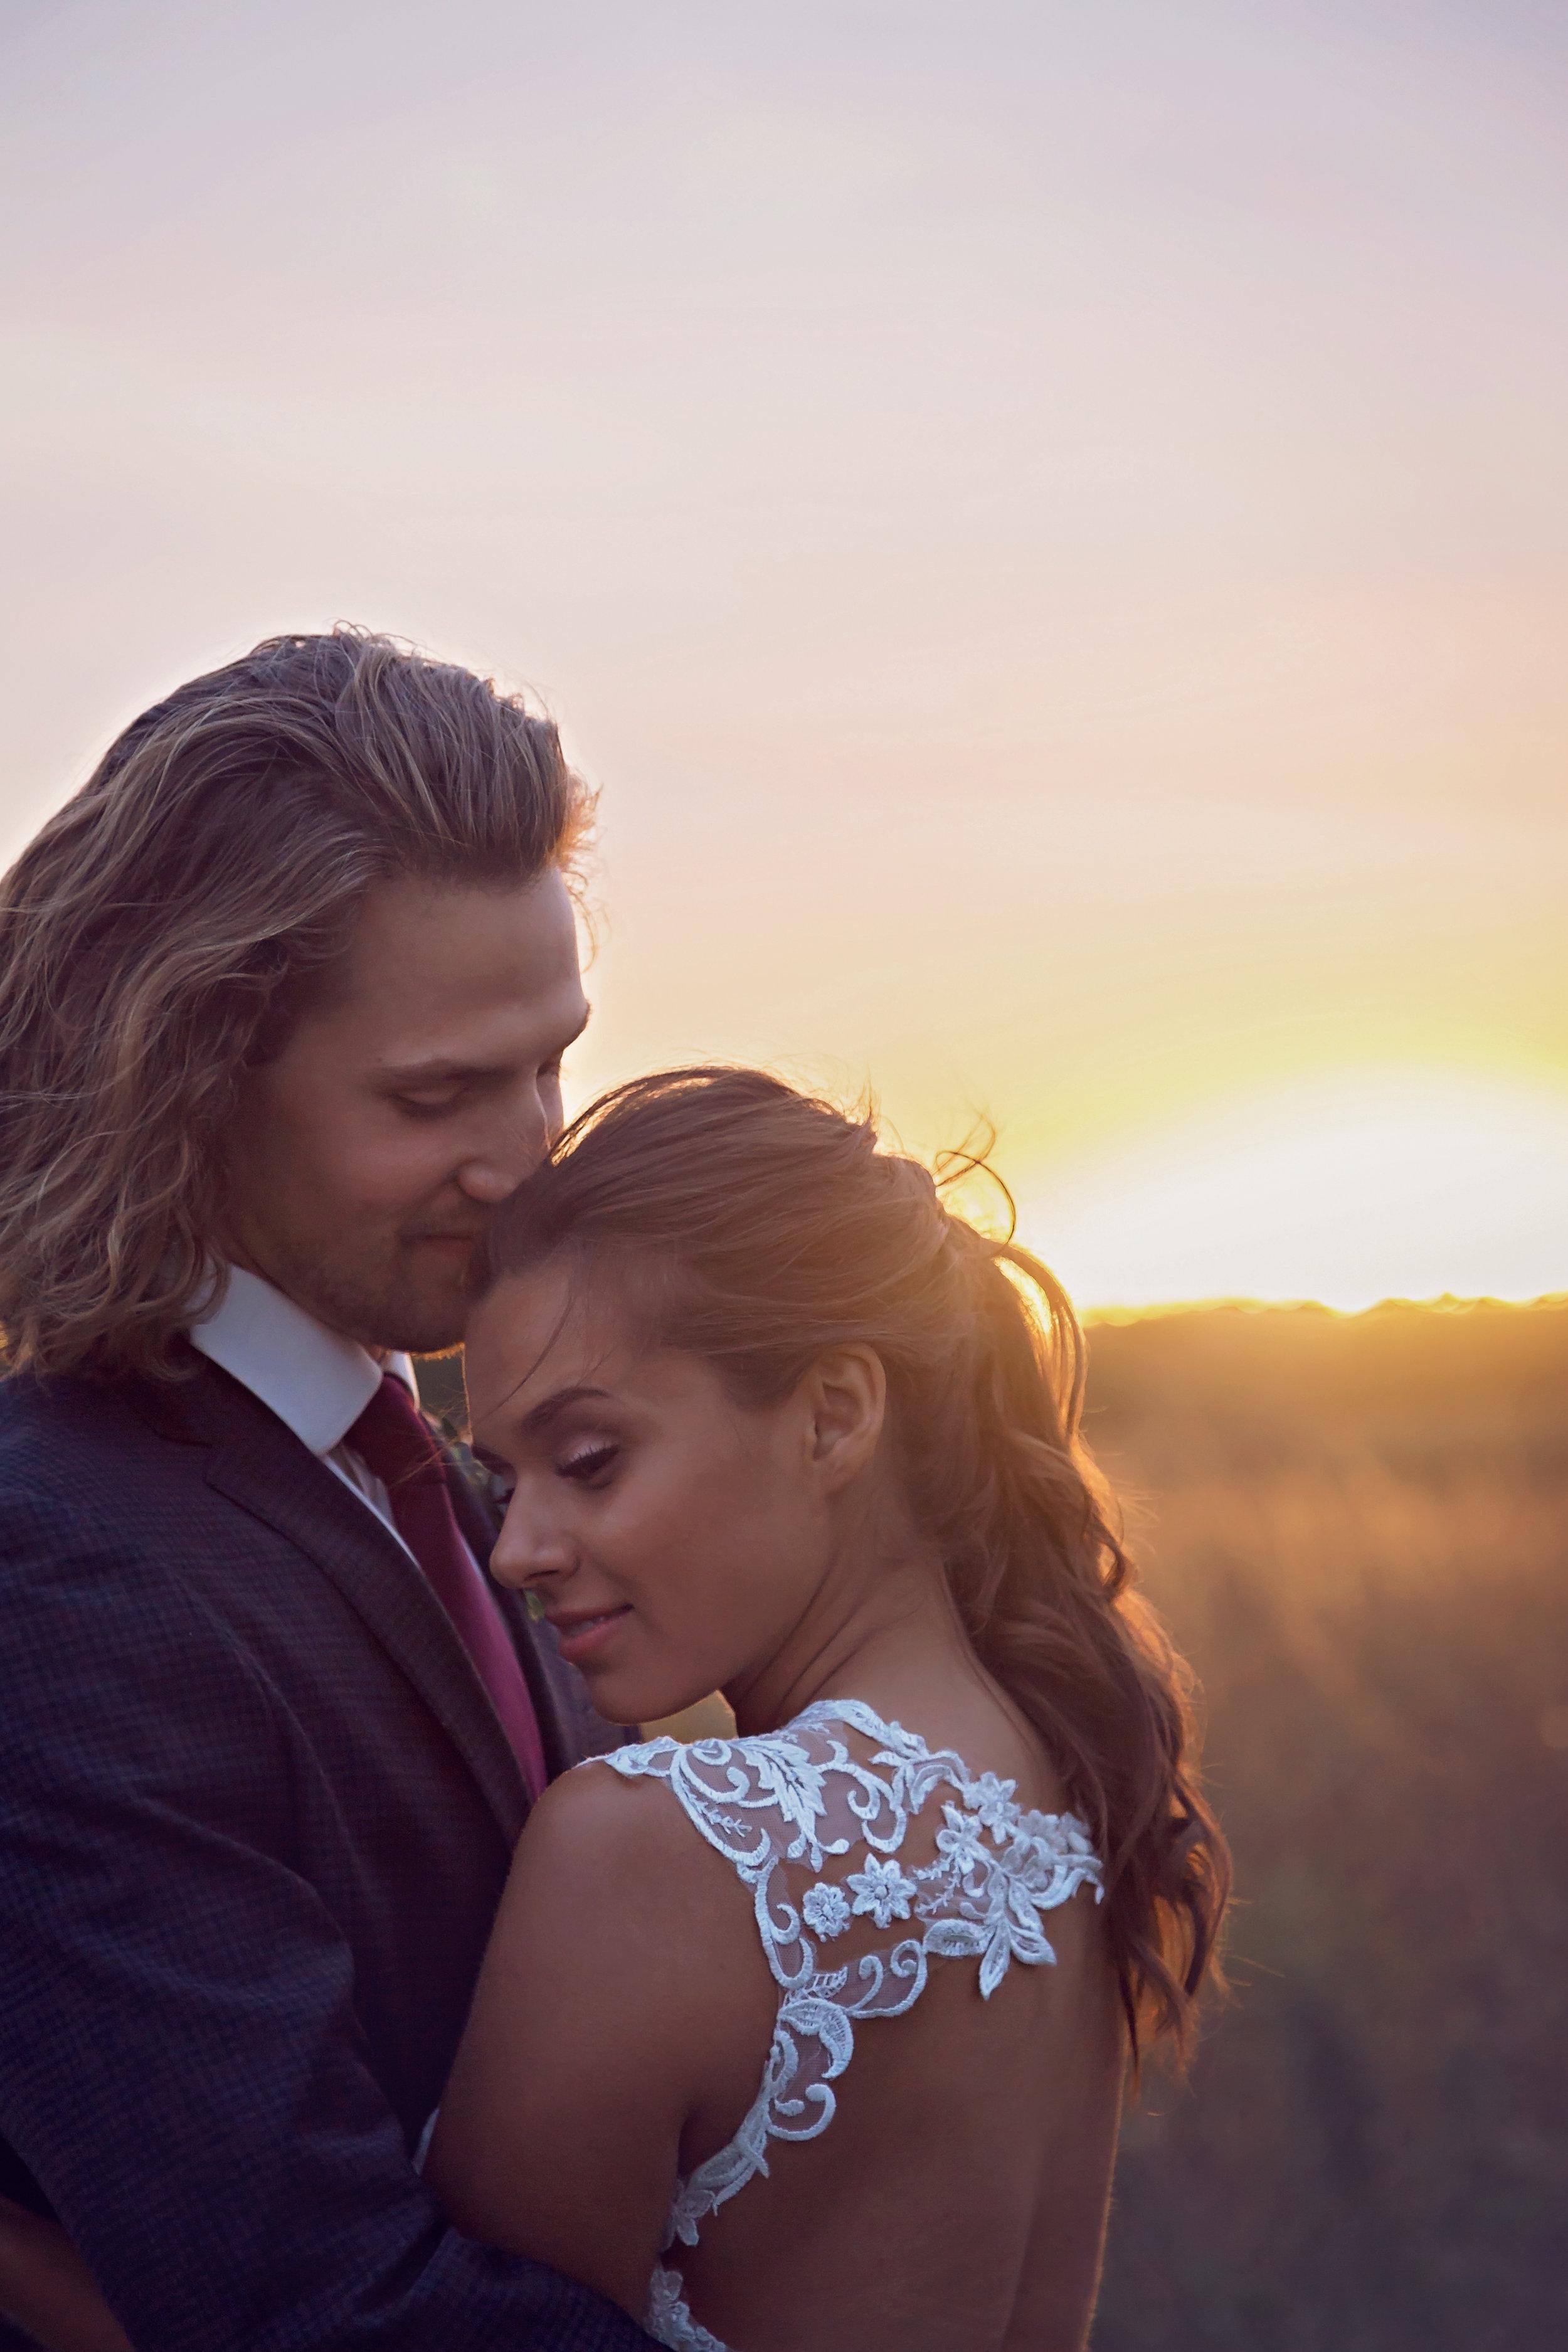 MINNESOTA WEDDING PHOTOGRAPHER   J. Longs   Inspire Bridal Boutique   Pamela Hernandez Beauty  INTUITION WEDDINGS BY ID PHOTOGRAPHY